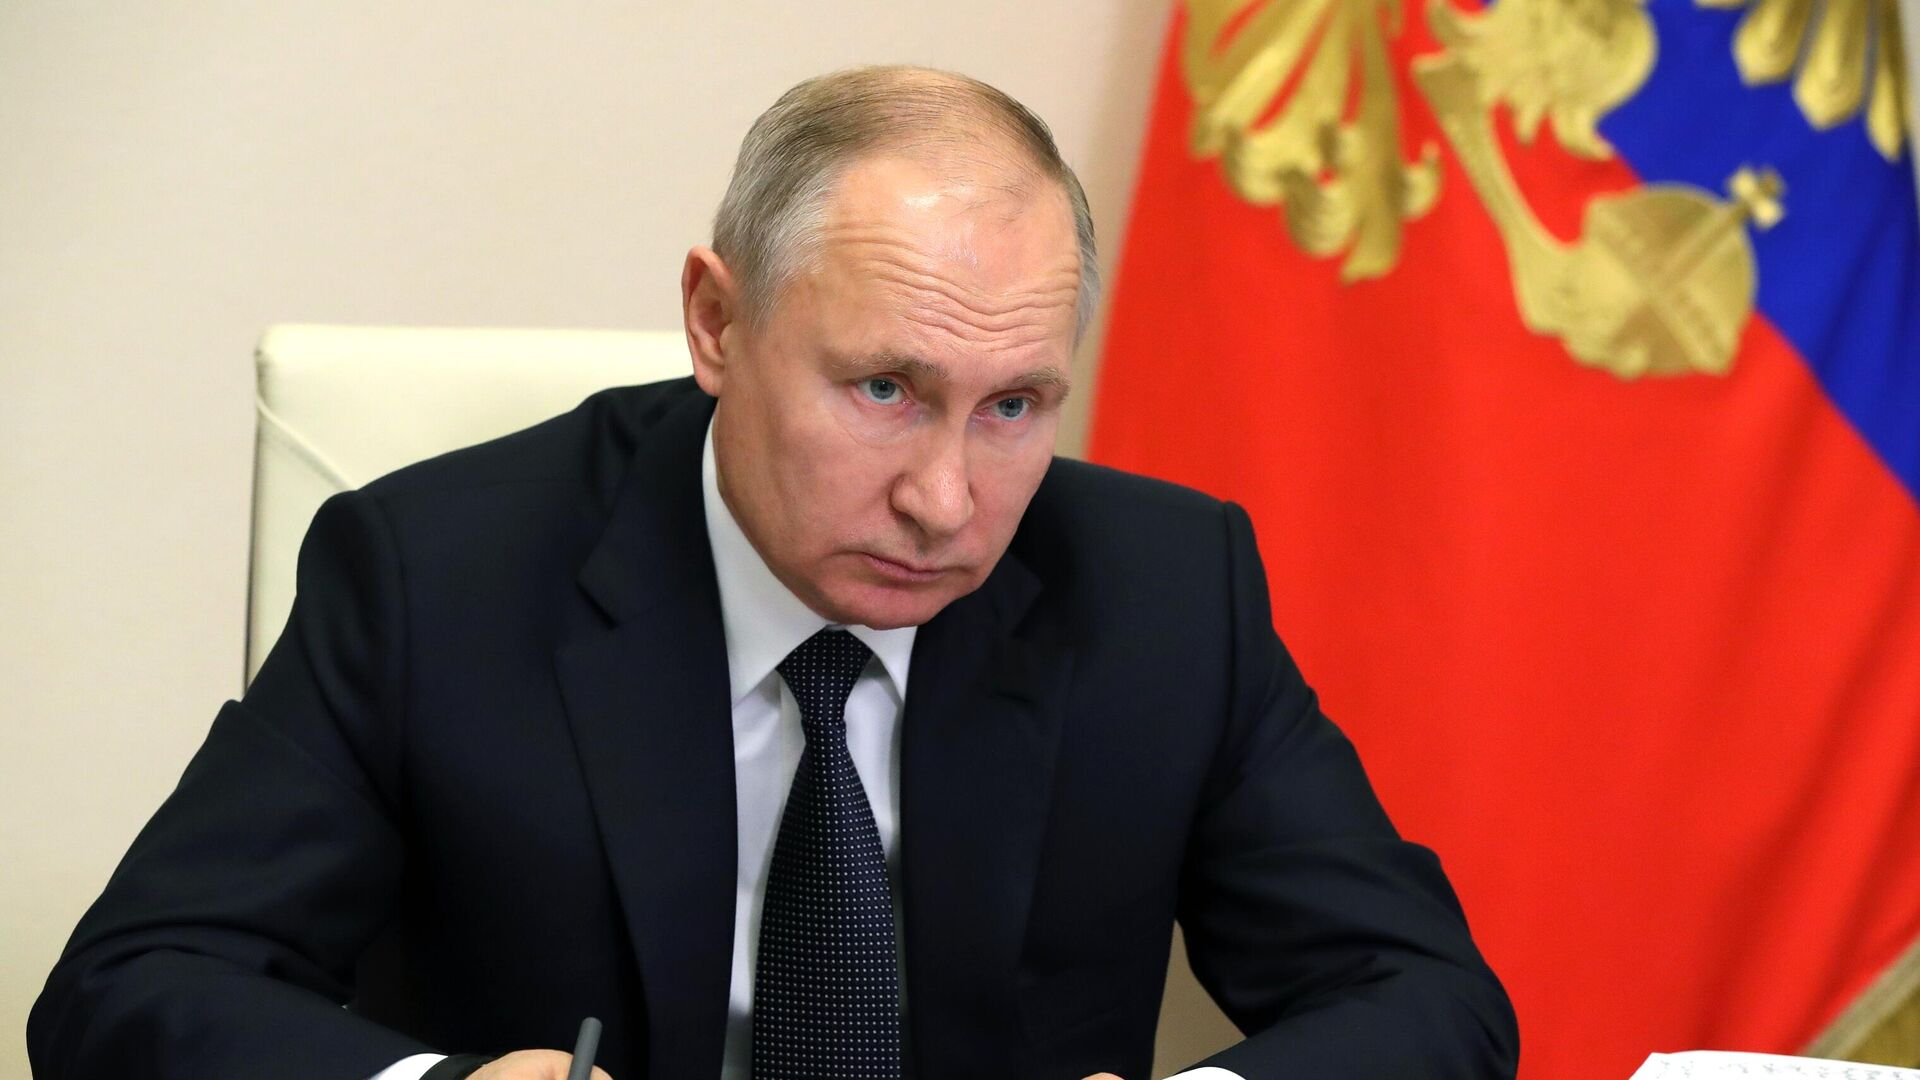 Президент России Владимир Путин - Sputnik Таджикистан, 1920, 14.06.2021